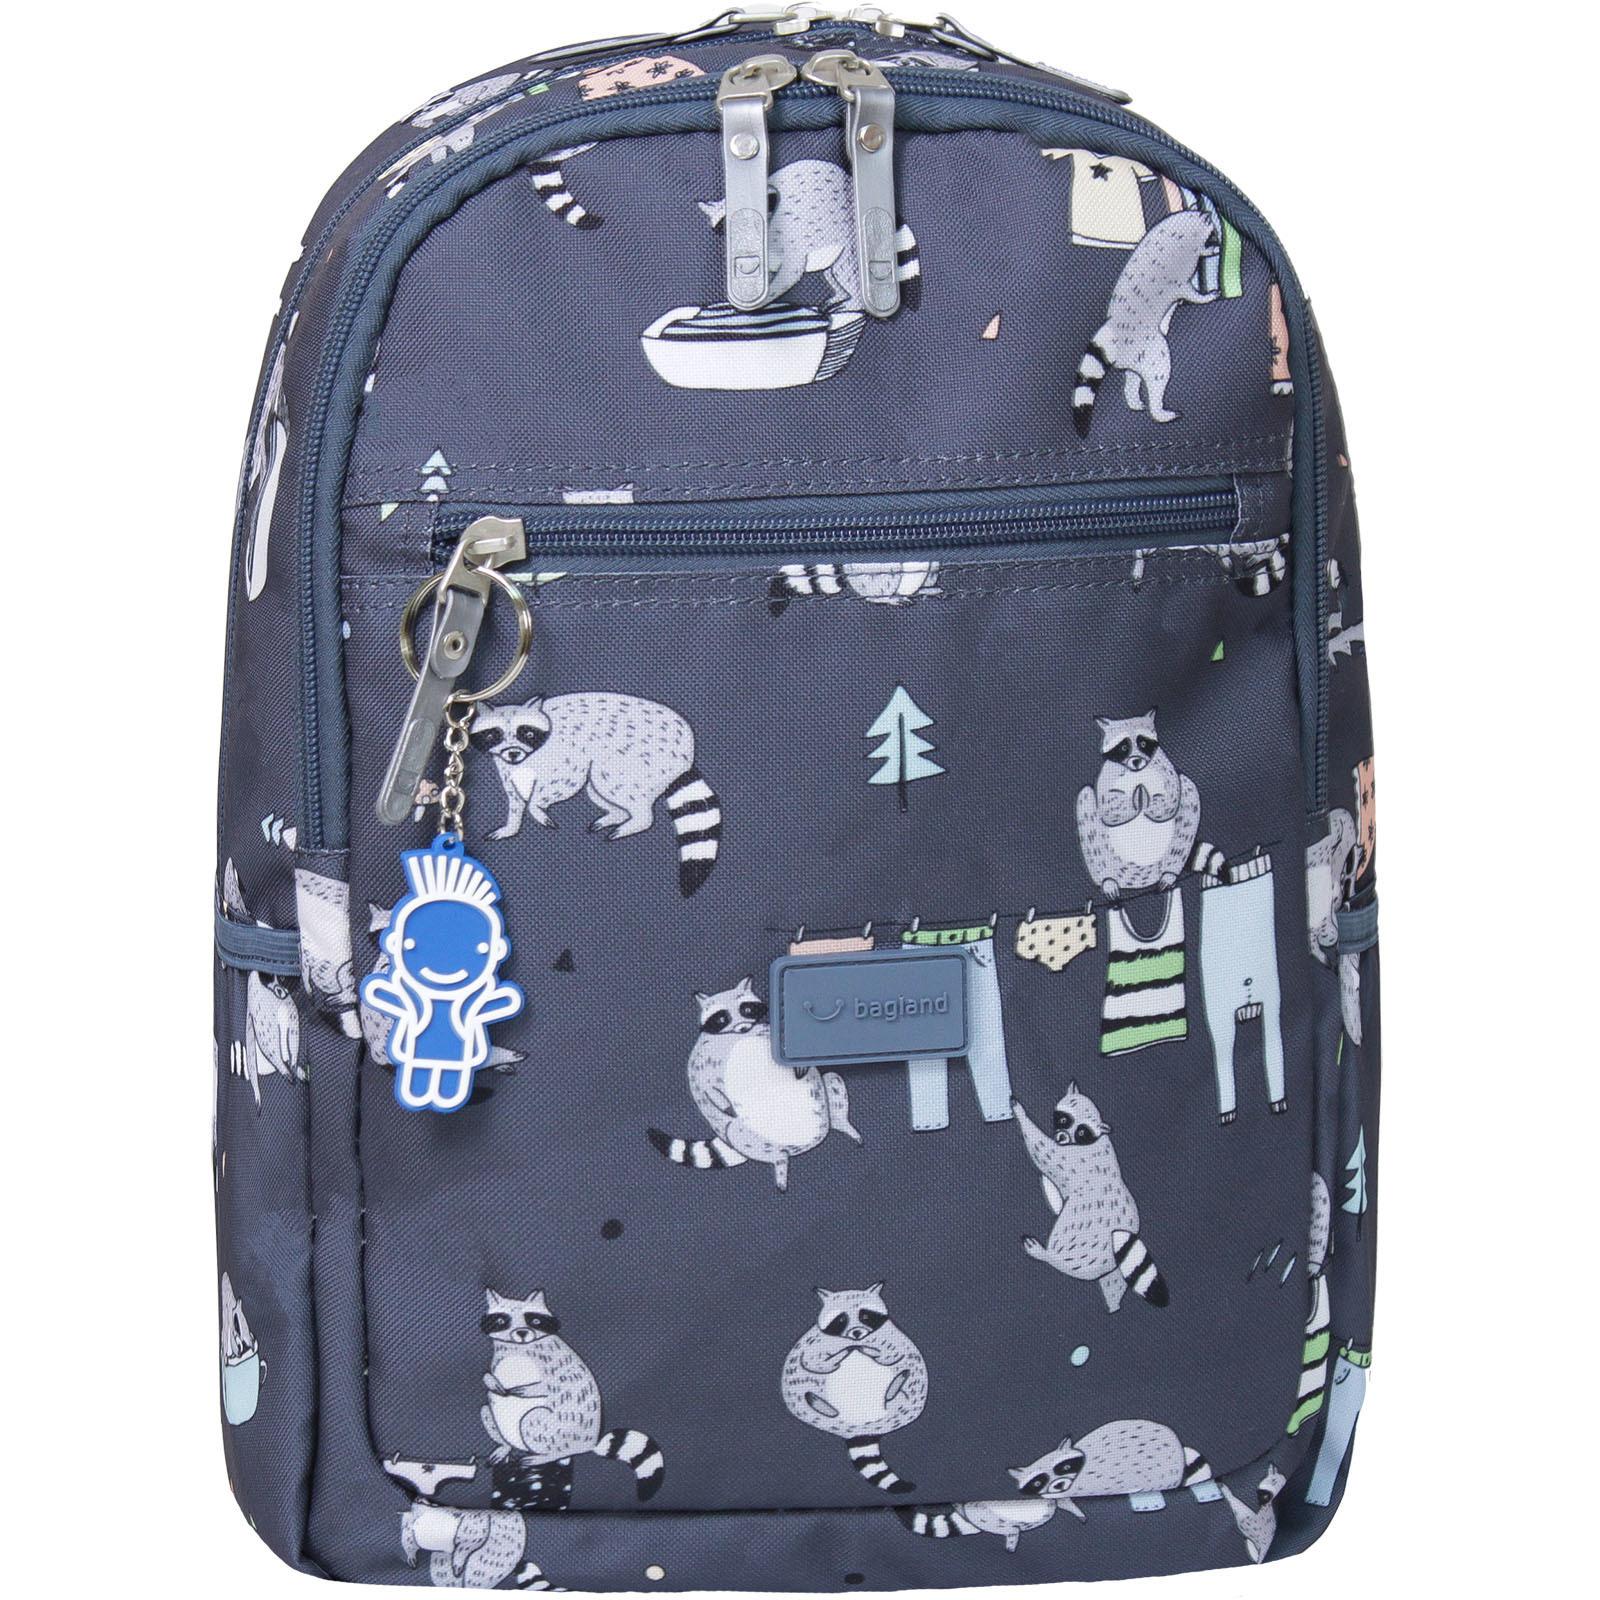 Детские рюкзаки Рюкзак Bagland Young 13 л. сублімація 220 (00510664) IMG_8867-1600.jpg